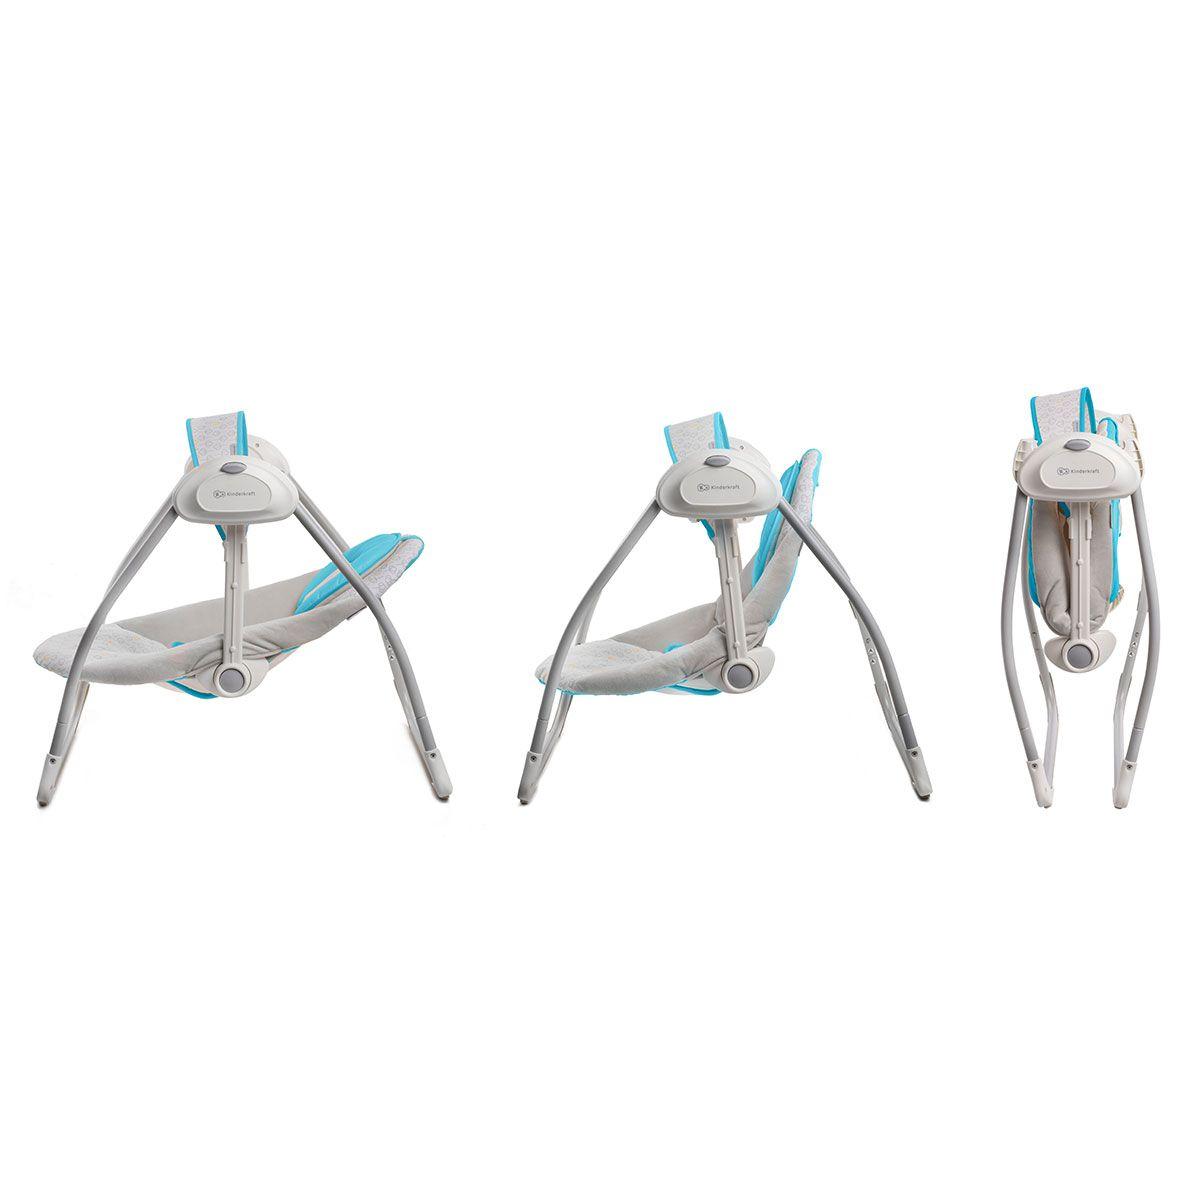 baby chair swinging model no ts bs 16 lounge chairs target kinderkraft nani blue bouncing swing seat